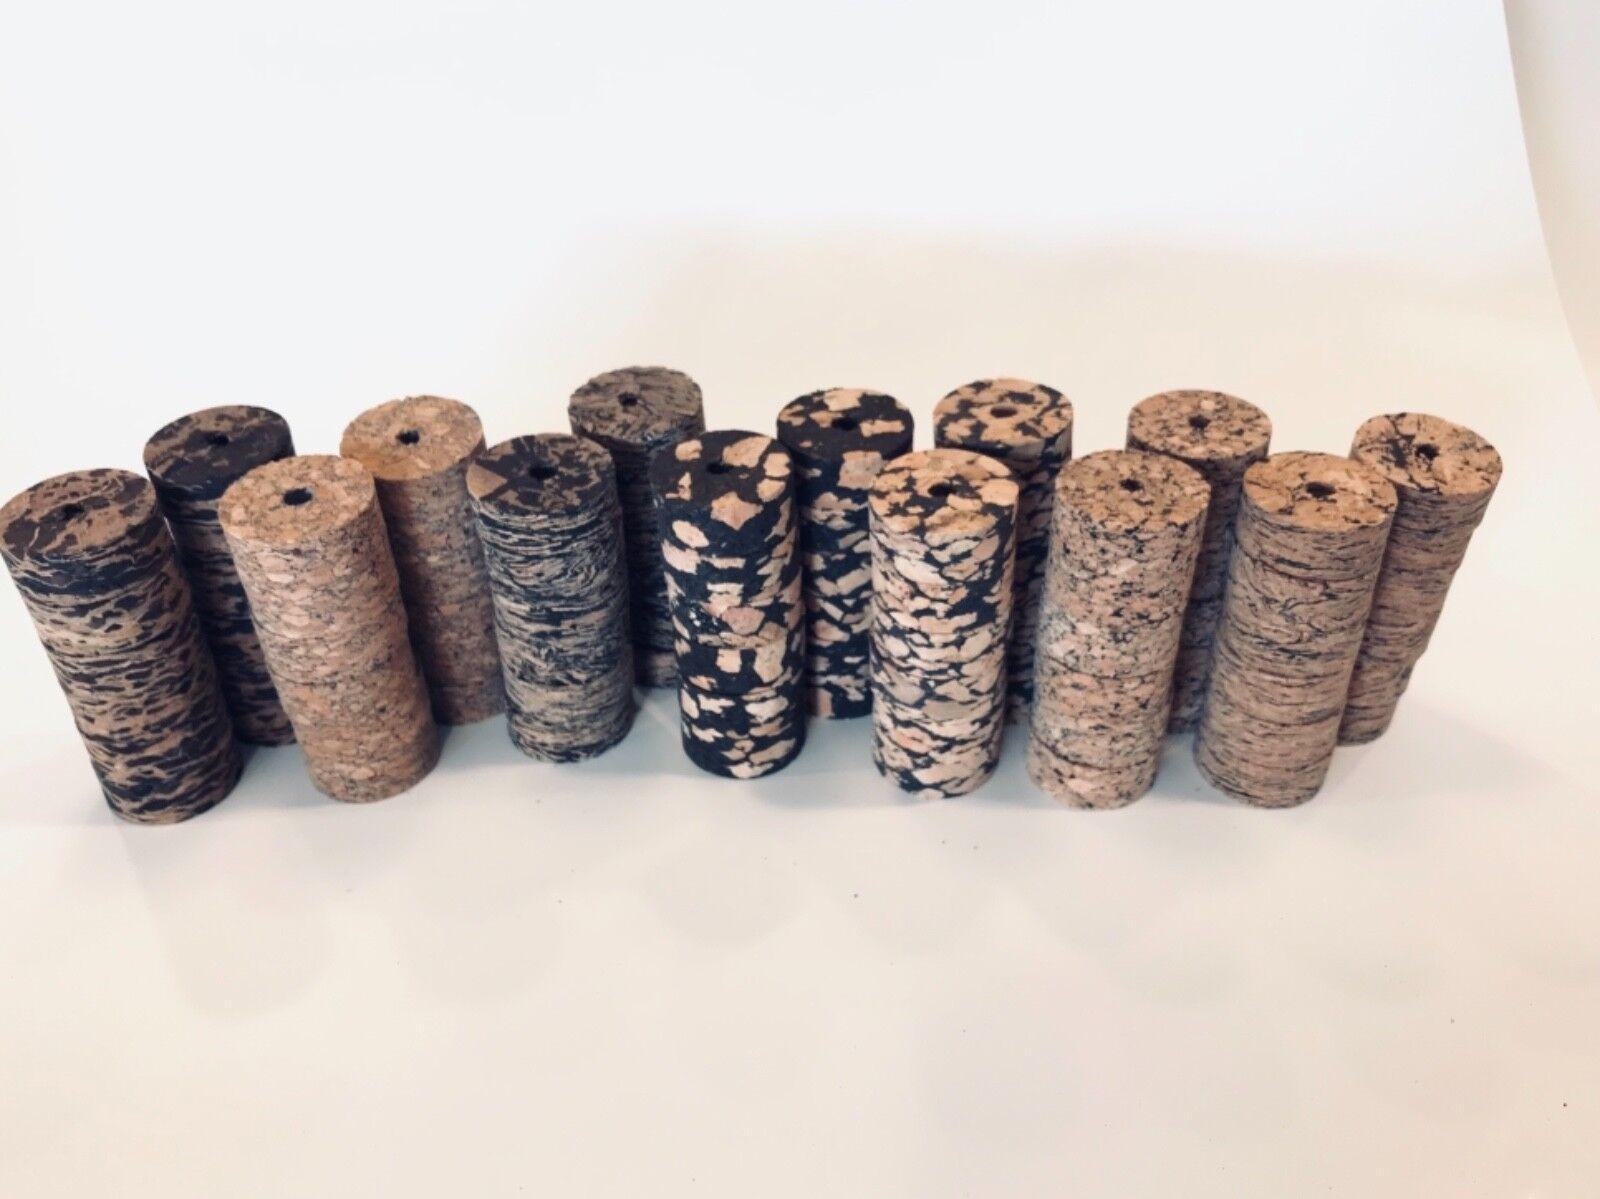 Cork Rings  Premium Burl  Assortment , 7 colors, 84 Rings, 1 1 4  x 1 2  x 1 4   brand outlet